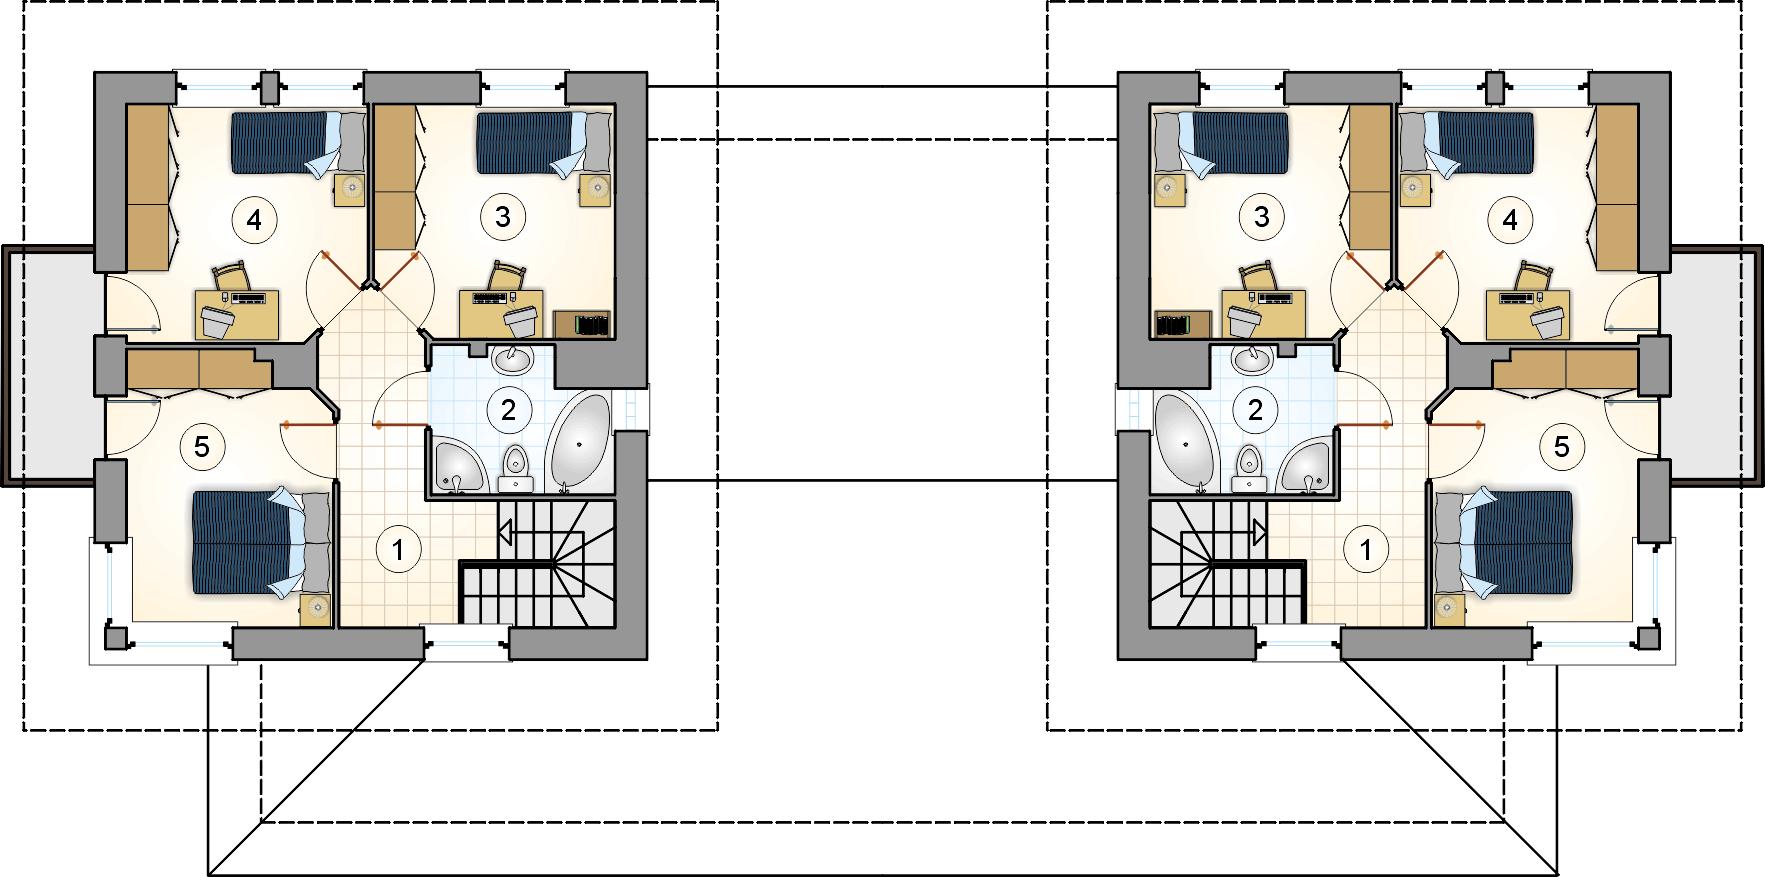 Rzut piętra - projekt Siena Duo